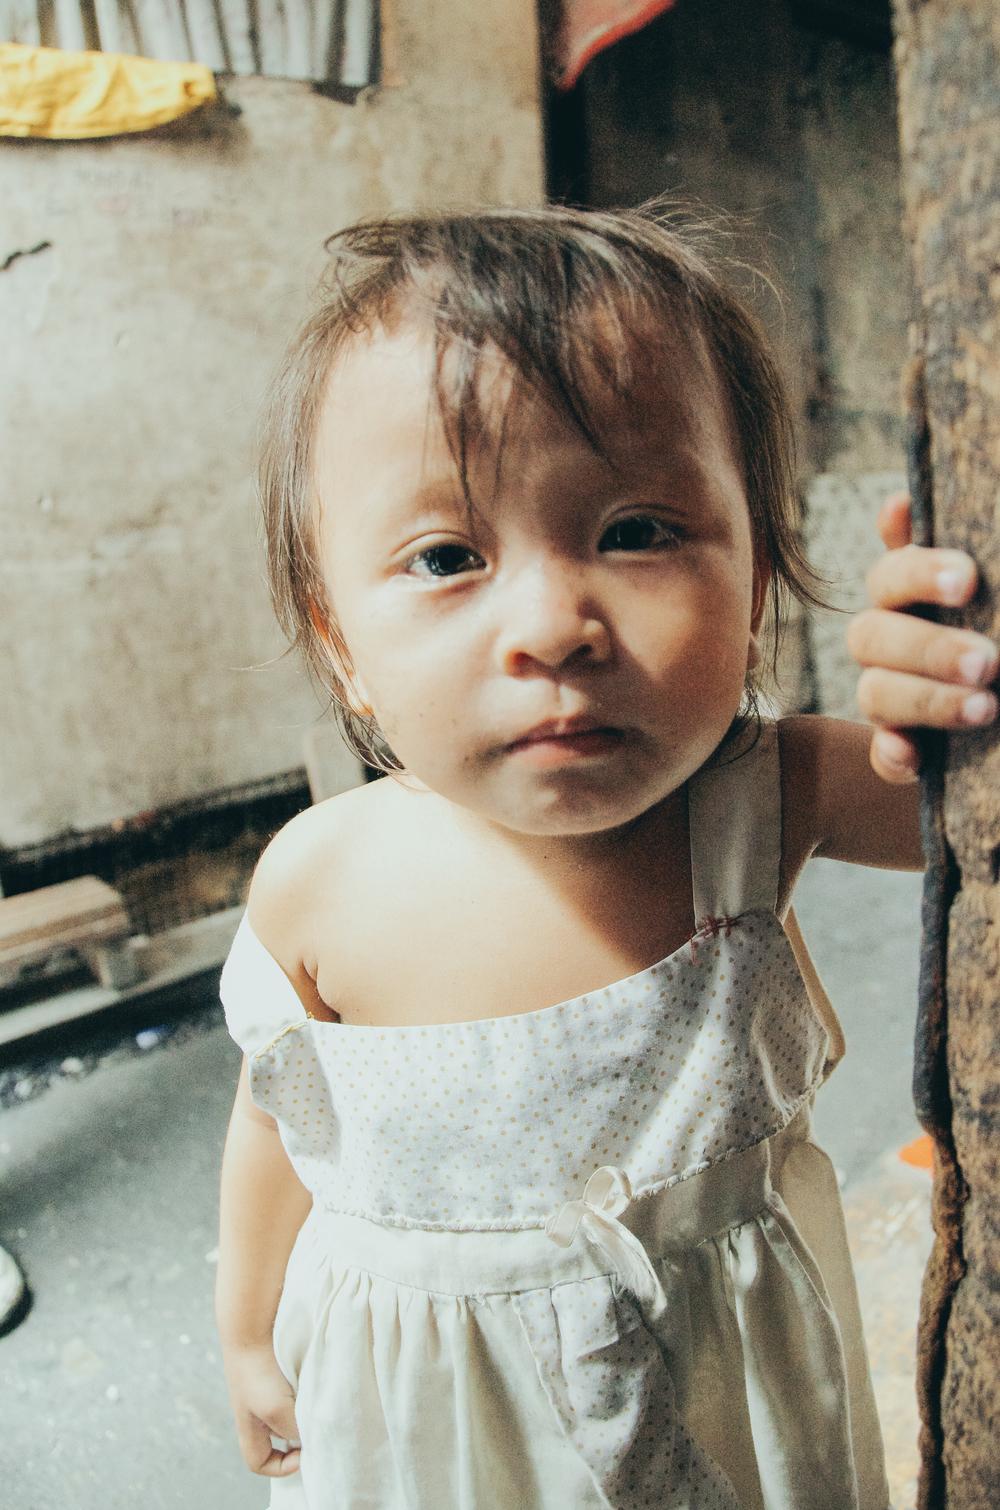 A-walk-through-the-slums-of-manila-philippines-7